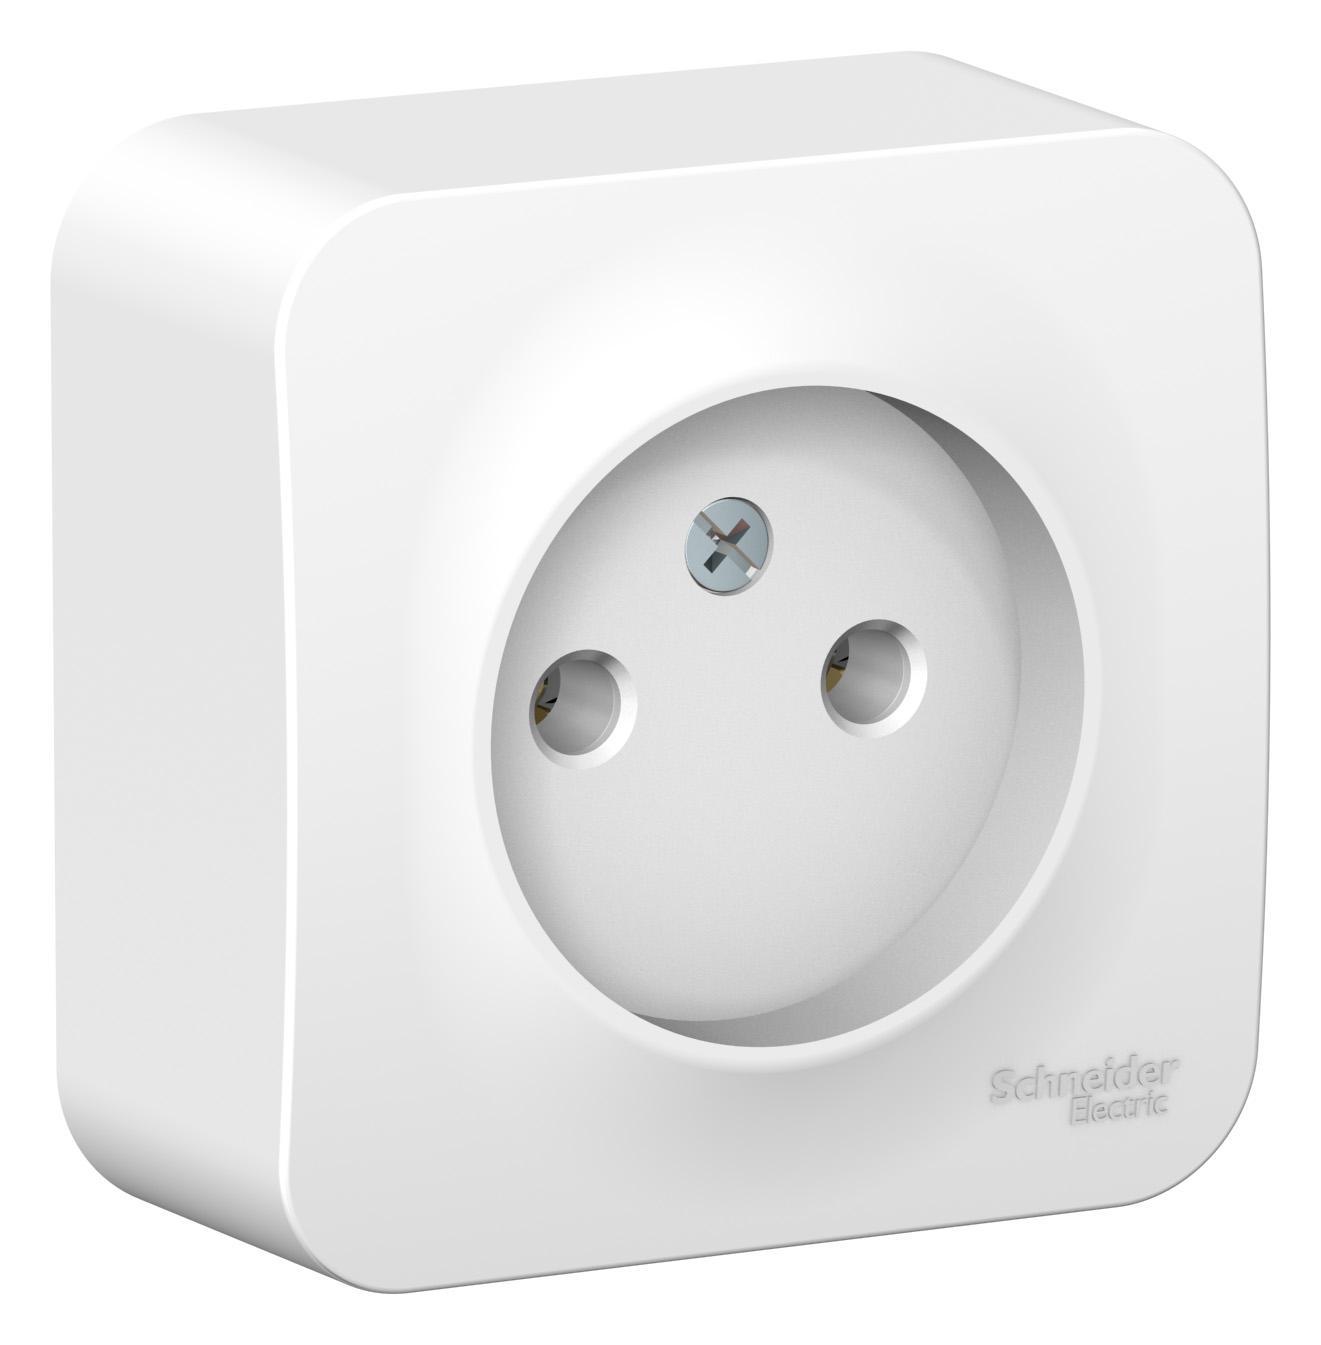 Розетка Schneider electric Blnra000101 blanca